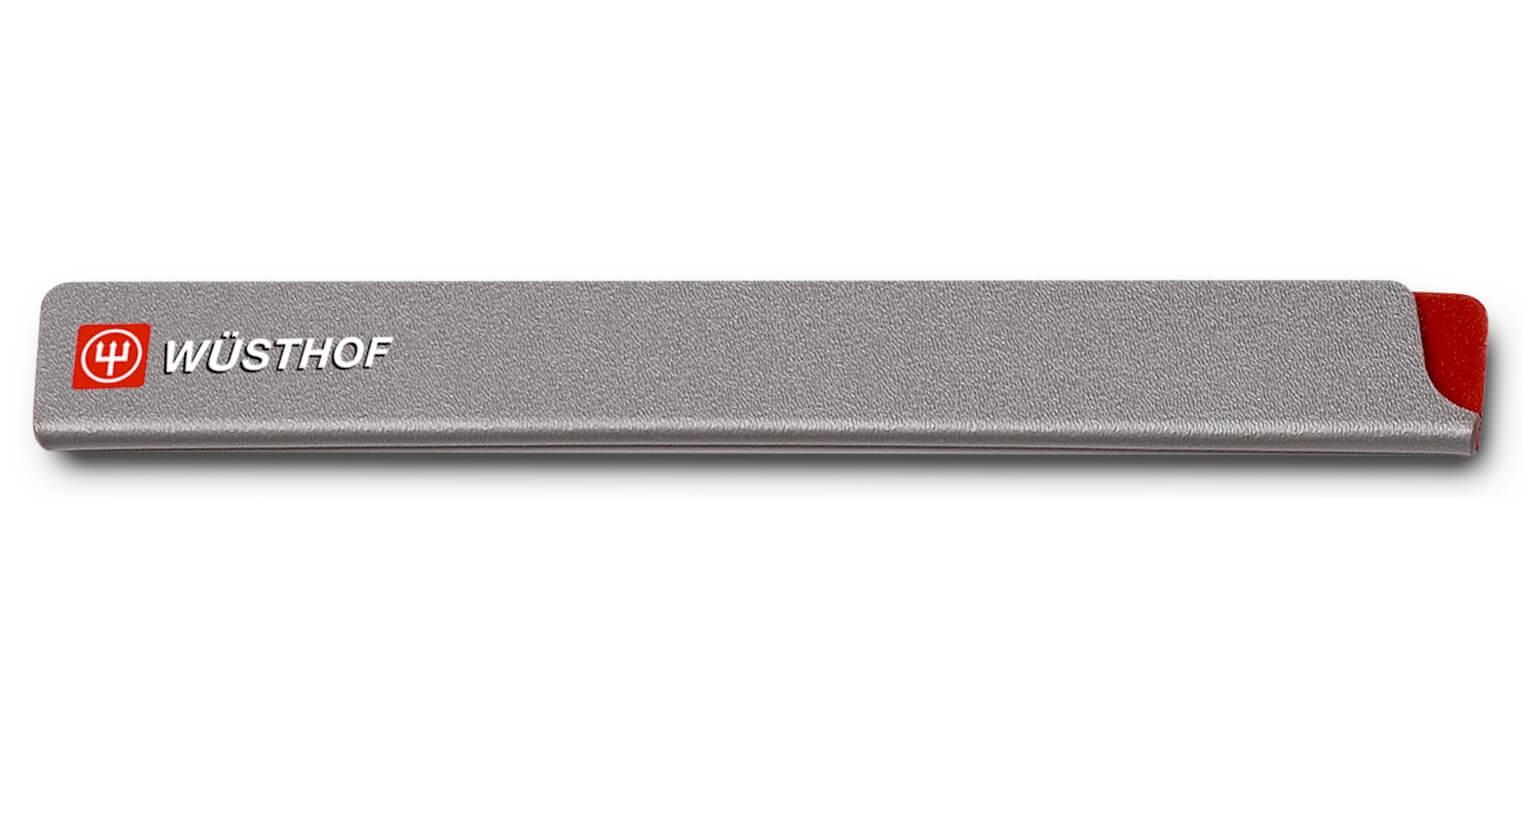 Онлайн каталог PROMENU: Футляр защитный для ножей Wuesthof до 20 см Wuesthof 9920-2